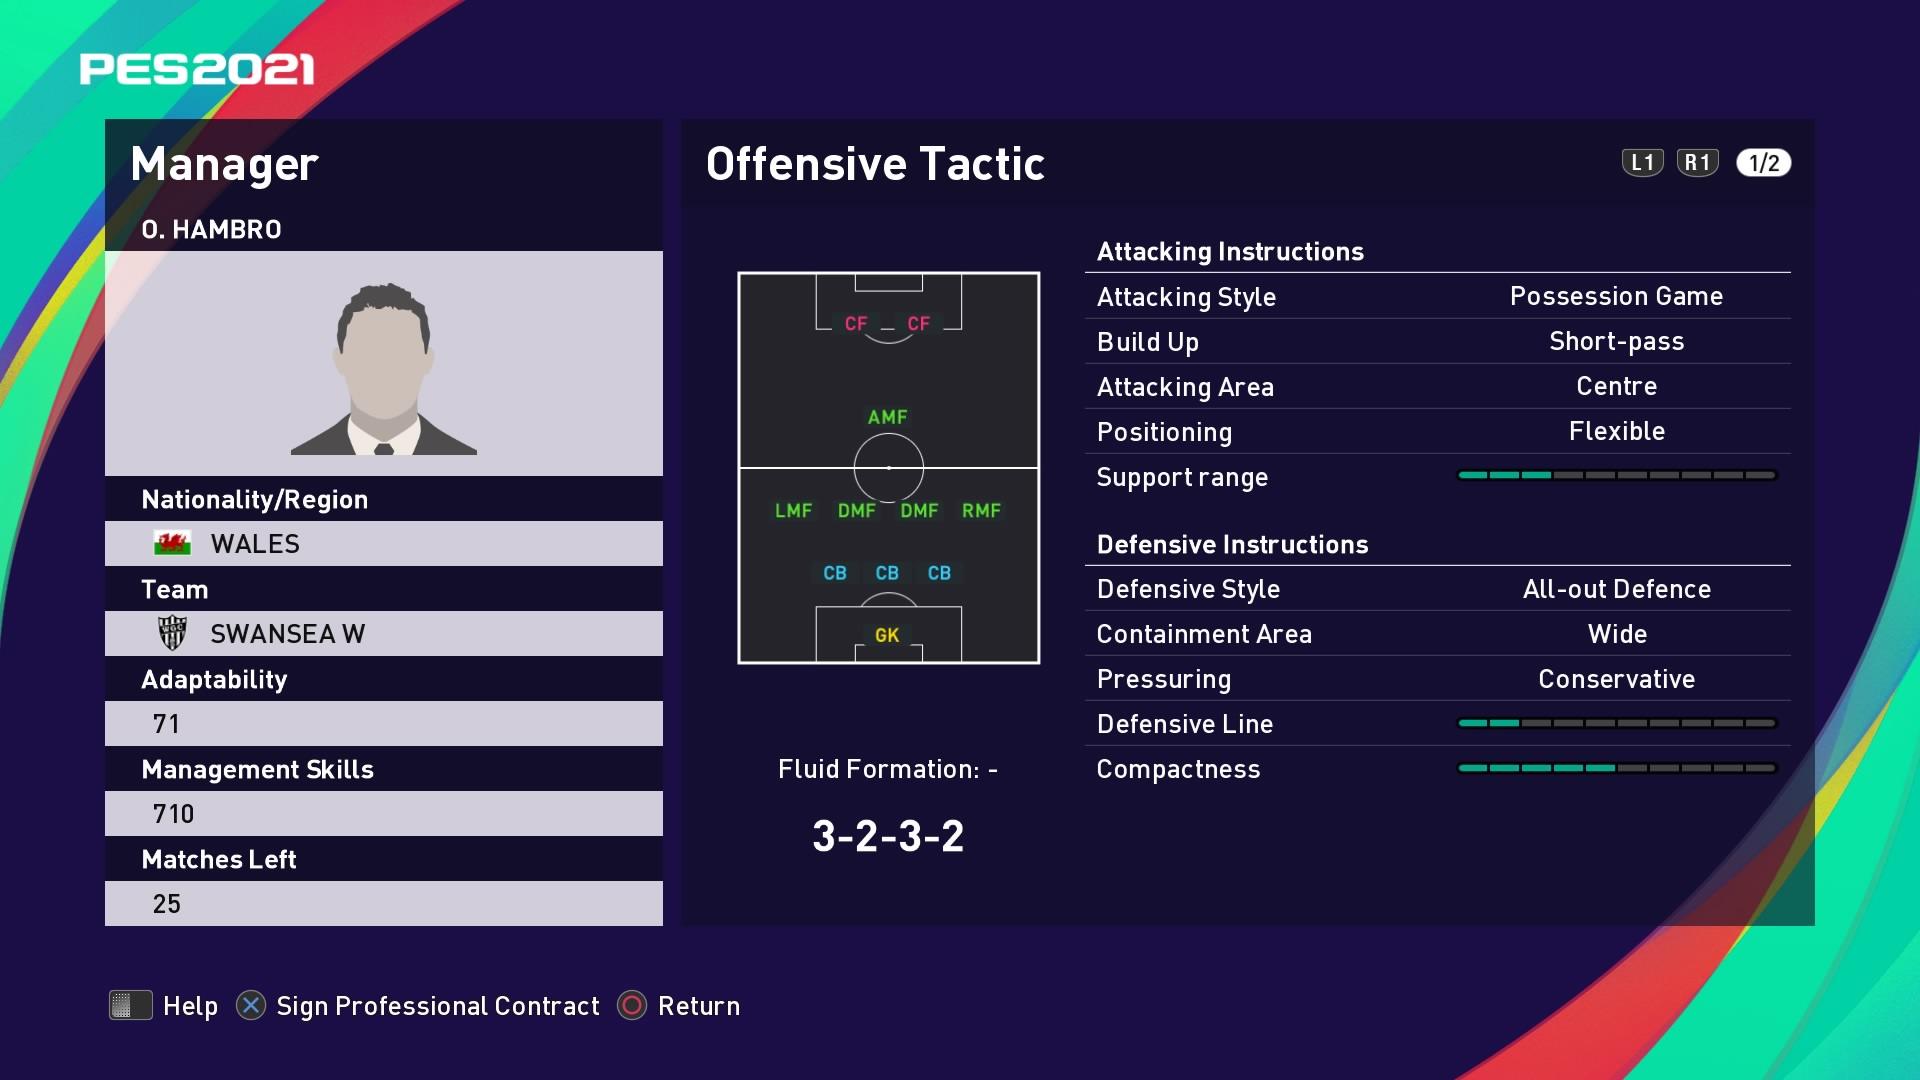 O. Hambro (Steve Cooper) Offensive Tactic in PES 2021 myClub